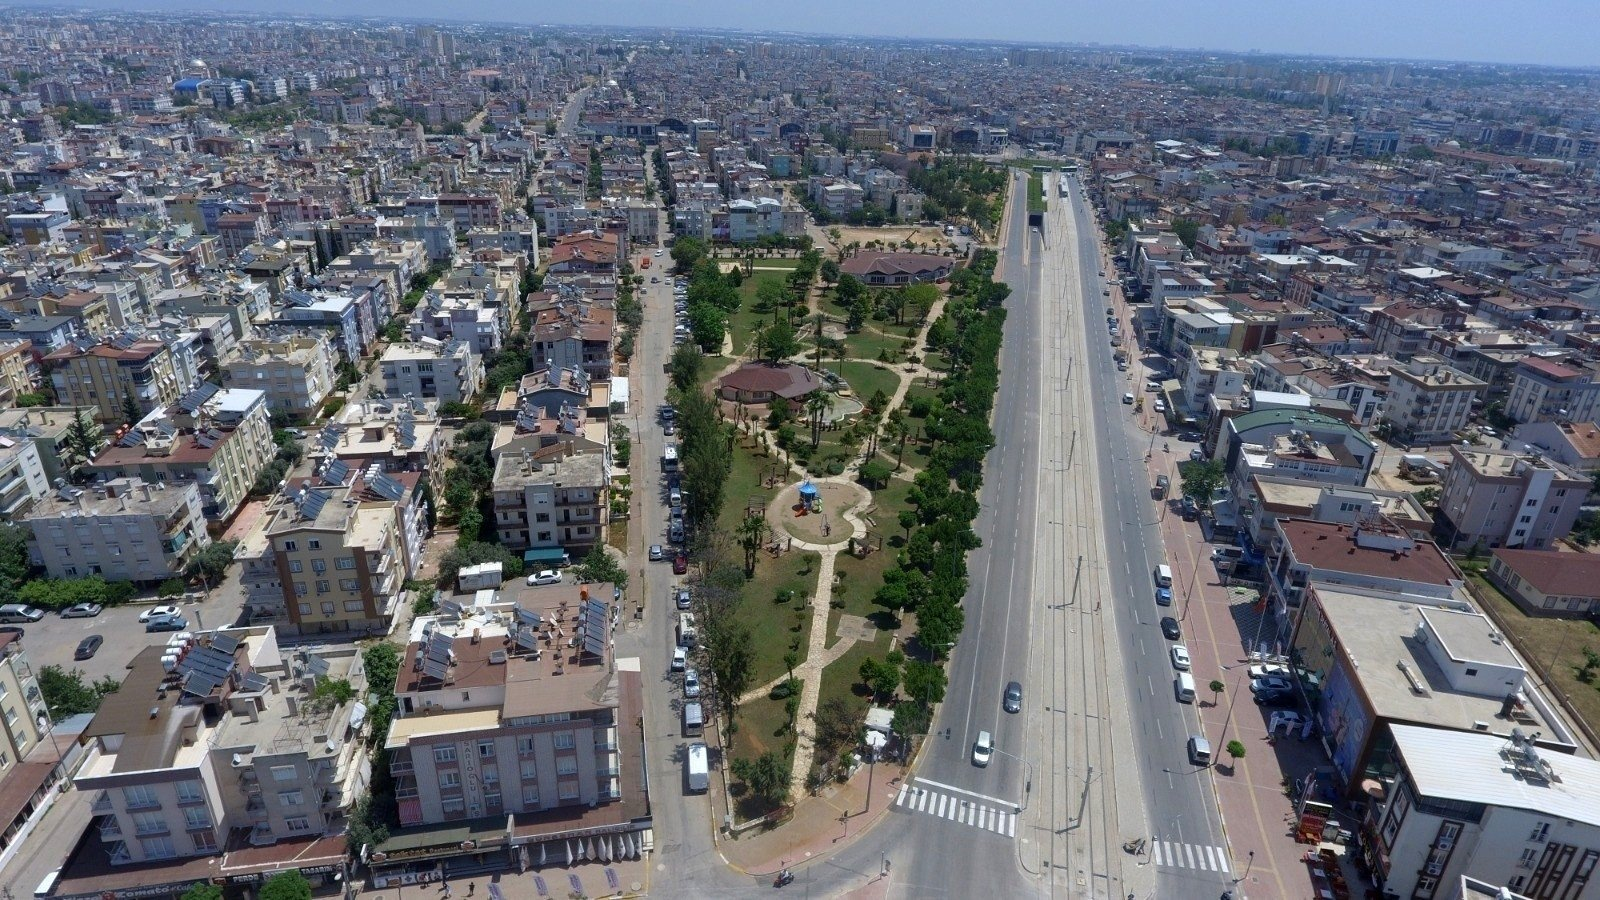 An aerial view of the Mediterranean province of Antalya, Turkey, Oct. 13, 2021. (IHA Photo)